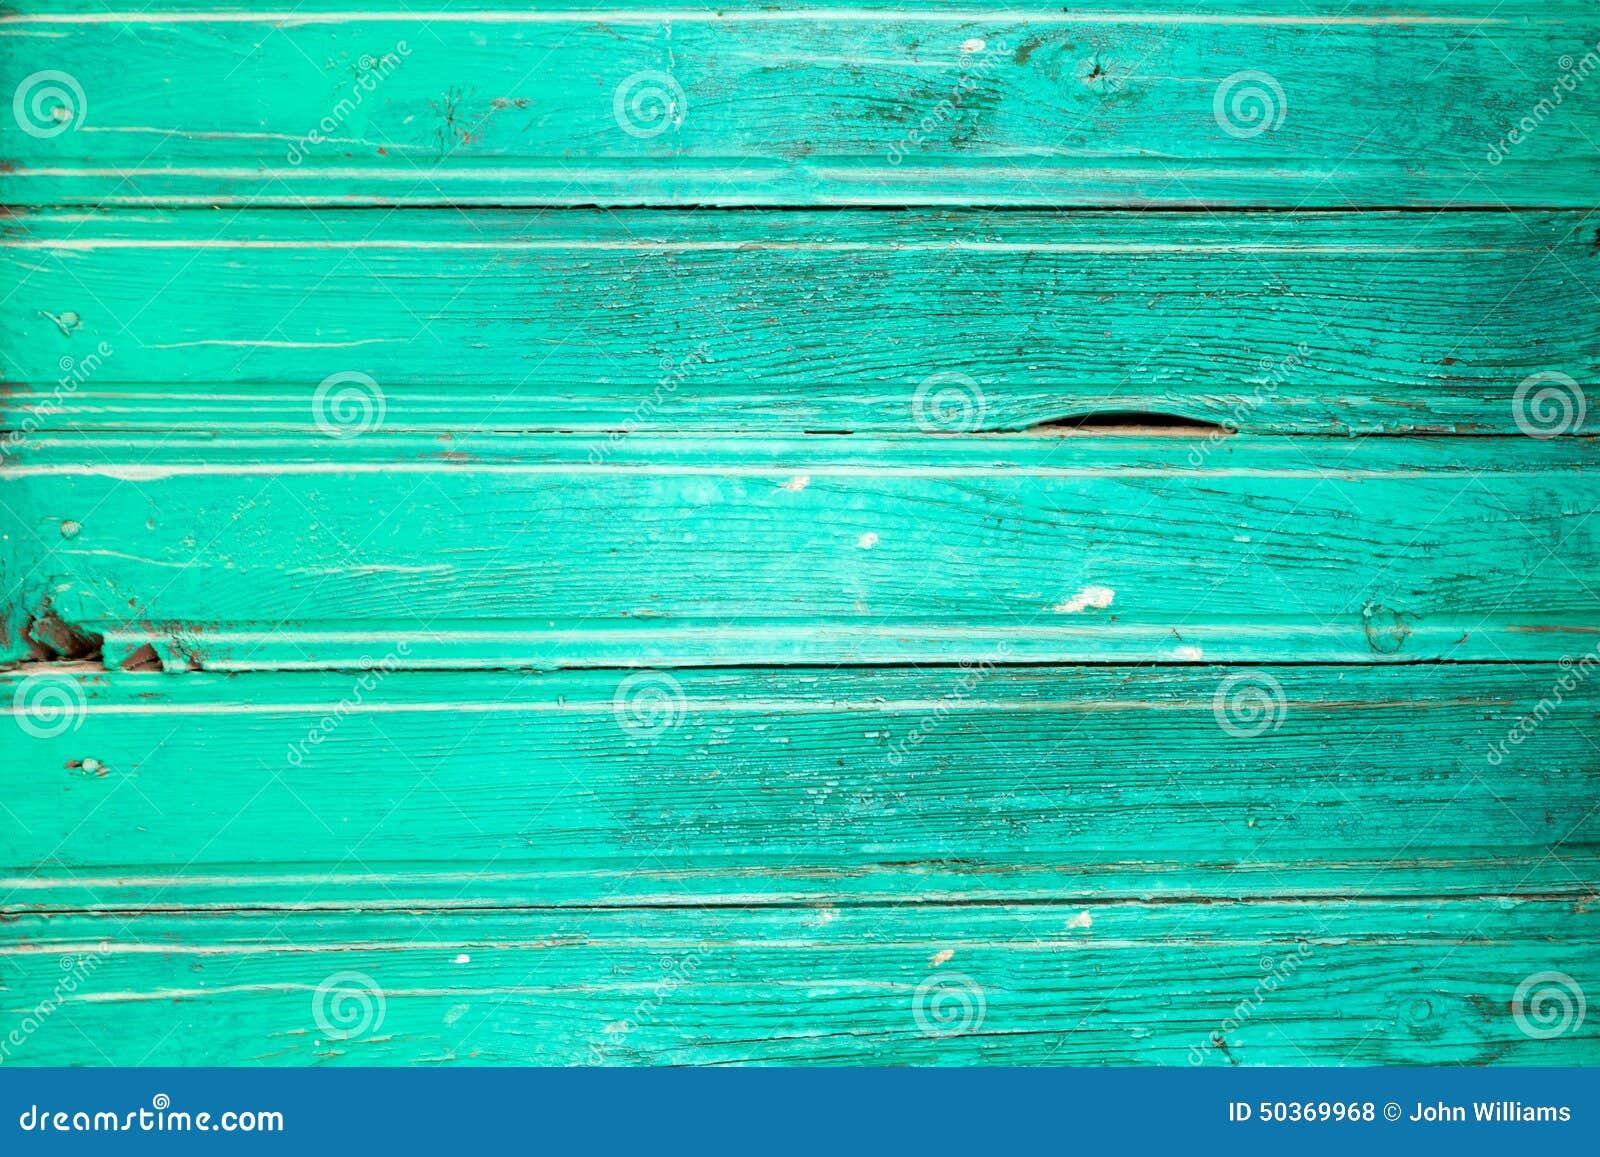 Fading Paint On Wood Stock Photo Image 50369968